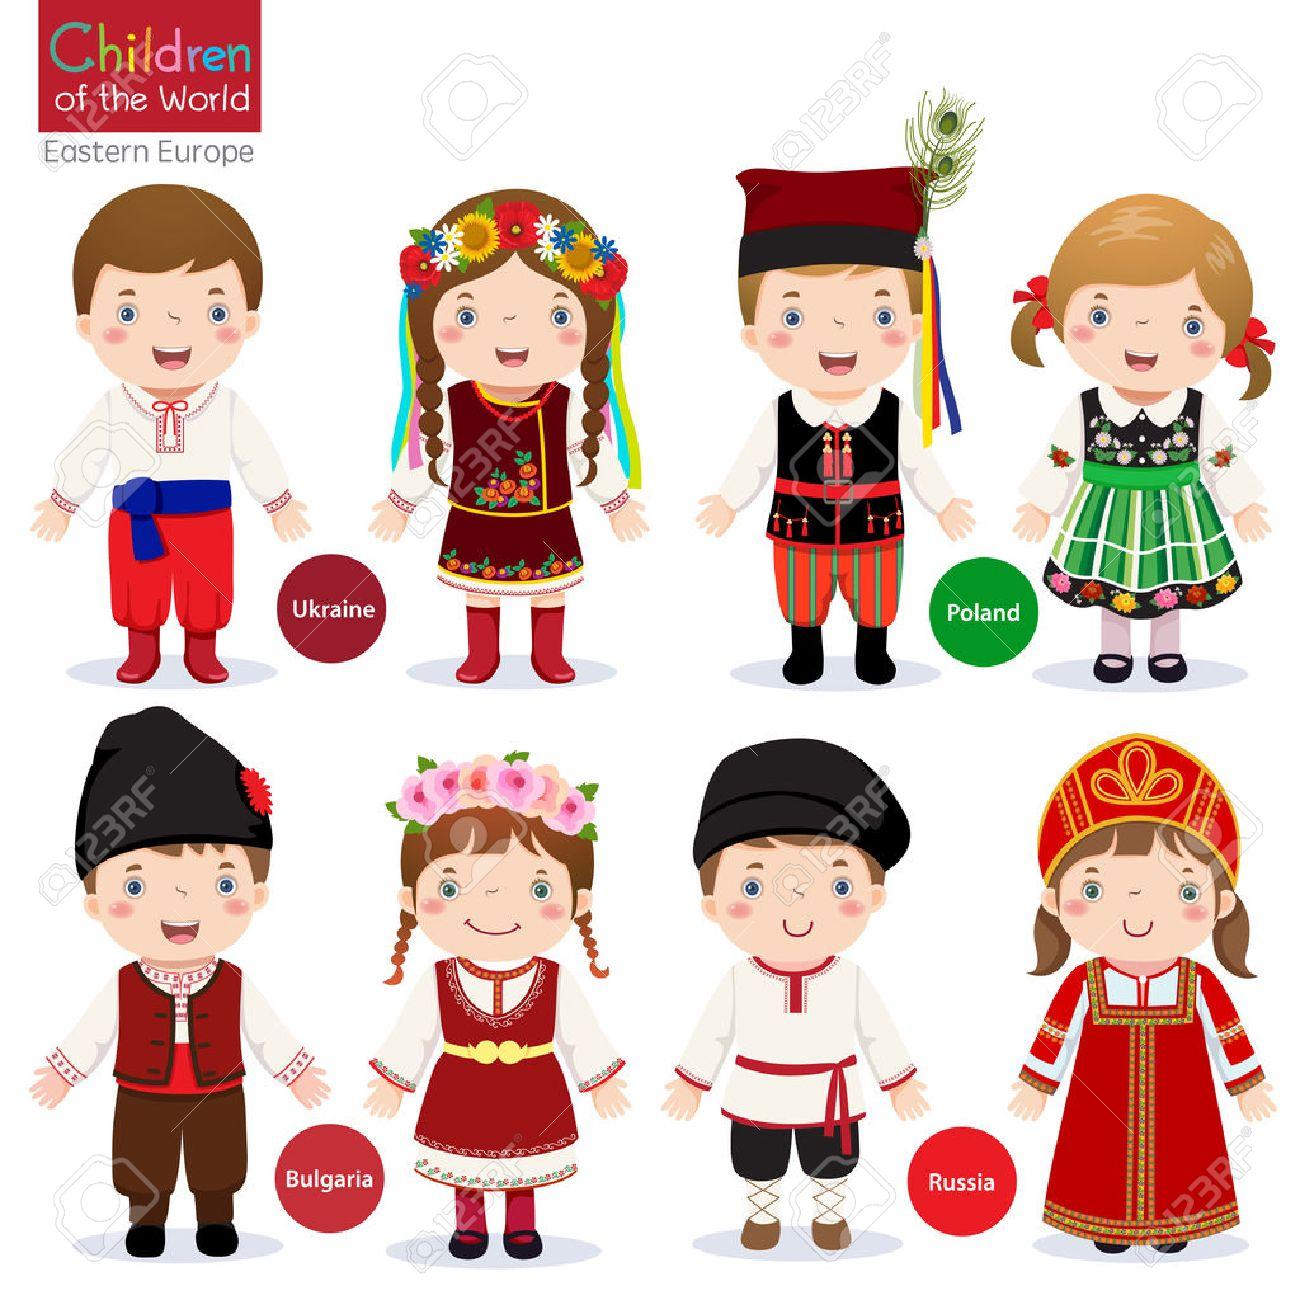 Kids in different traditional costumes Ukraine, Poland, Bulgaria, Russia - 53195127